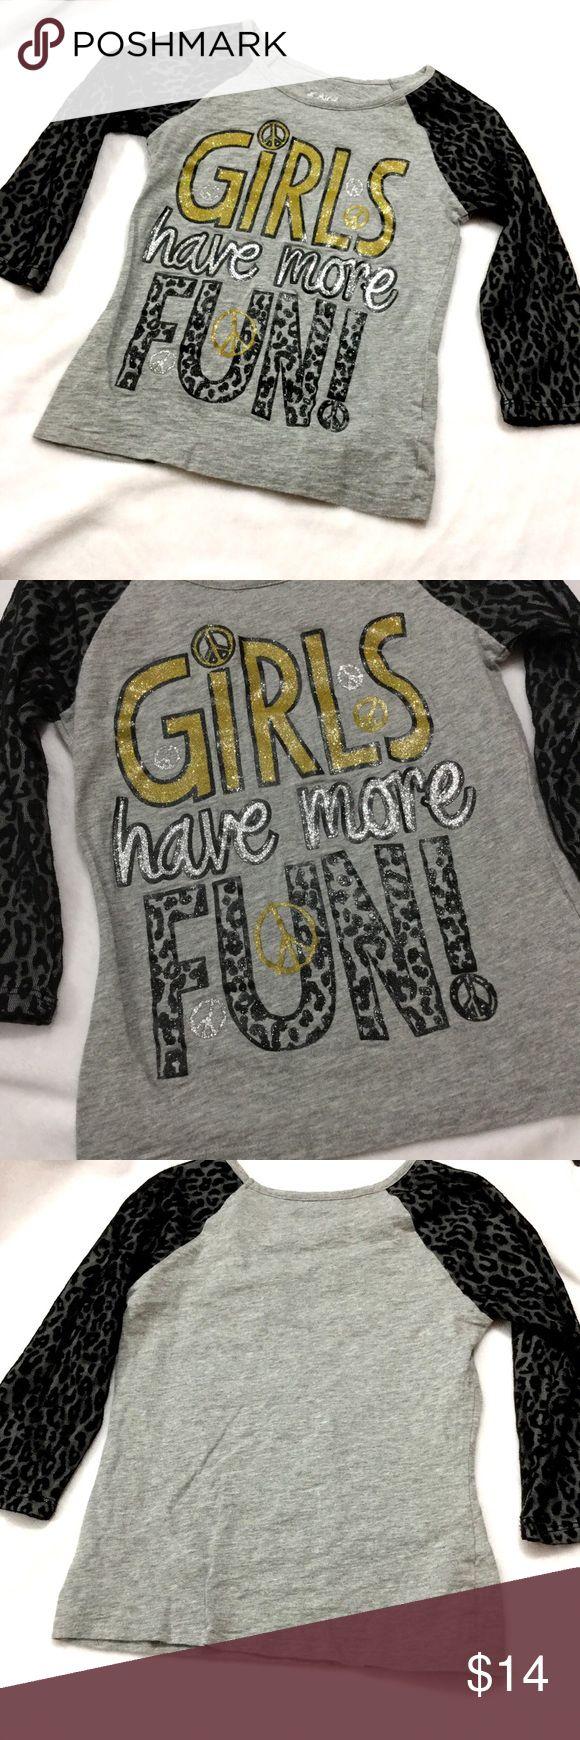 """Girls have more fun"" JUSTICE Cheetah print top ""Girls have more fun"" JUSTICE Cheetah print top. Size 7 Justice Shirts & Tops Tees - Long Sleeve"